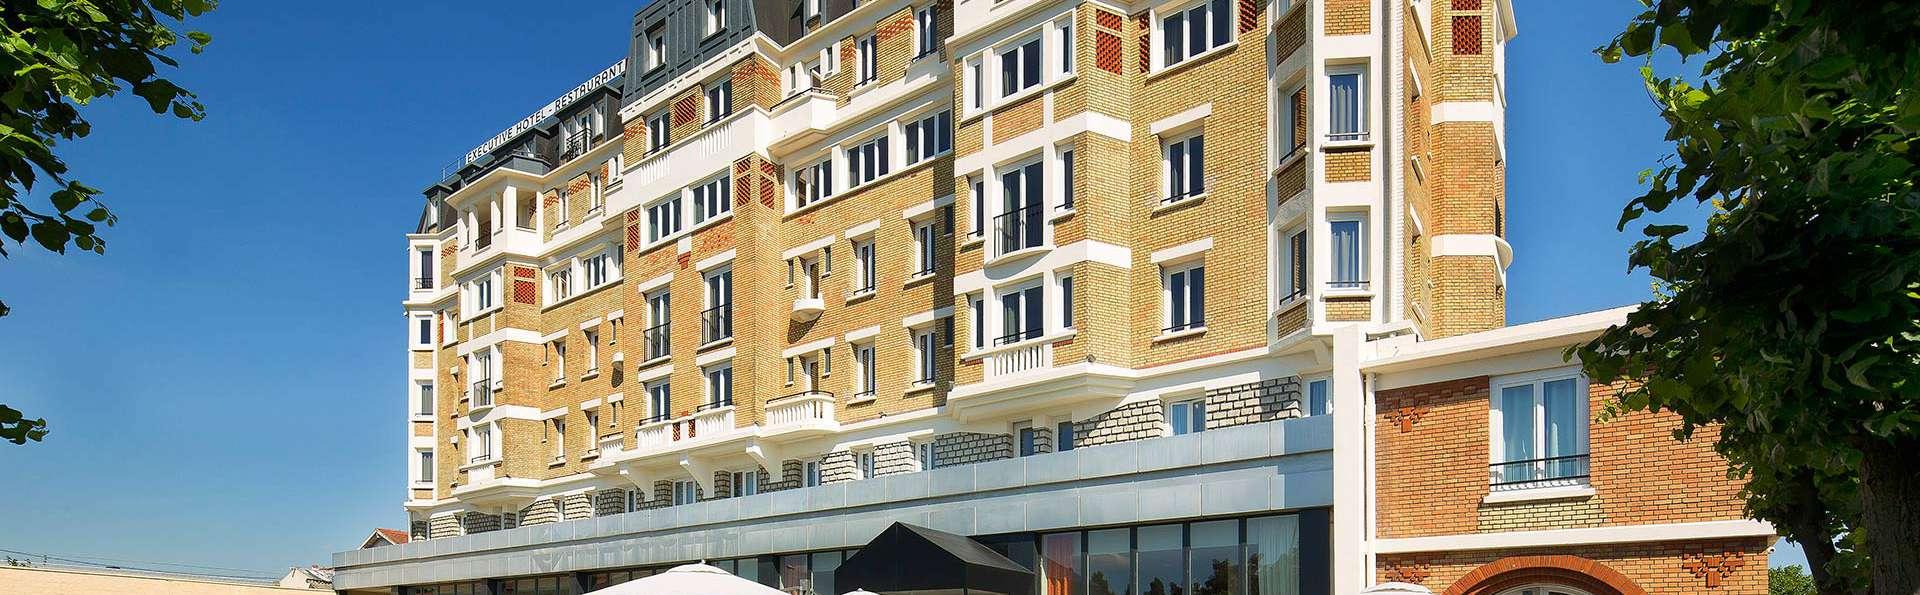 Executive Hotel Paris Gennevilliers - EDIT_front.jpg